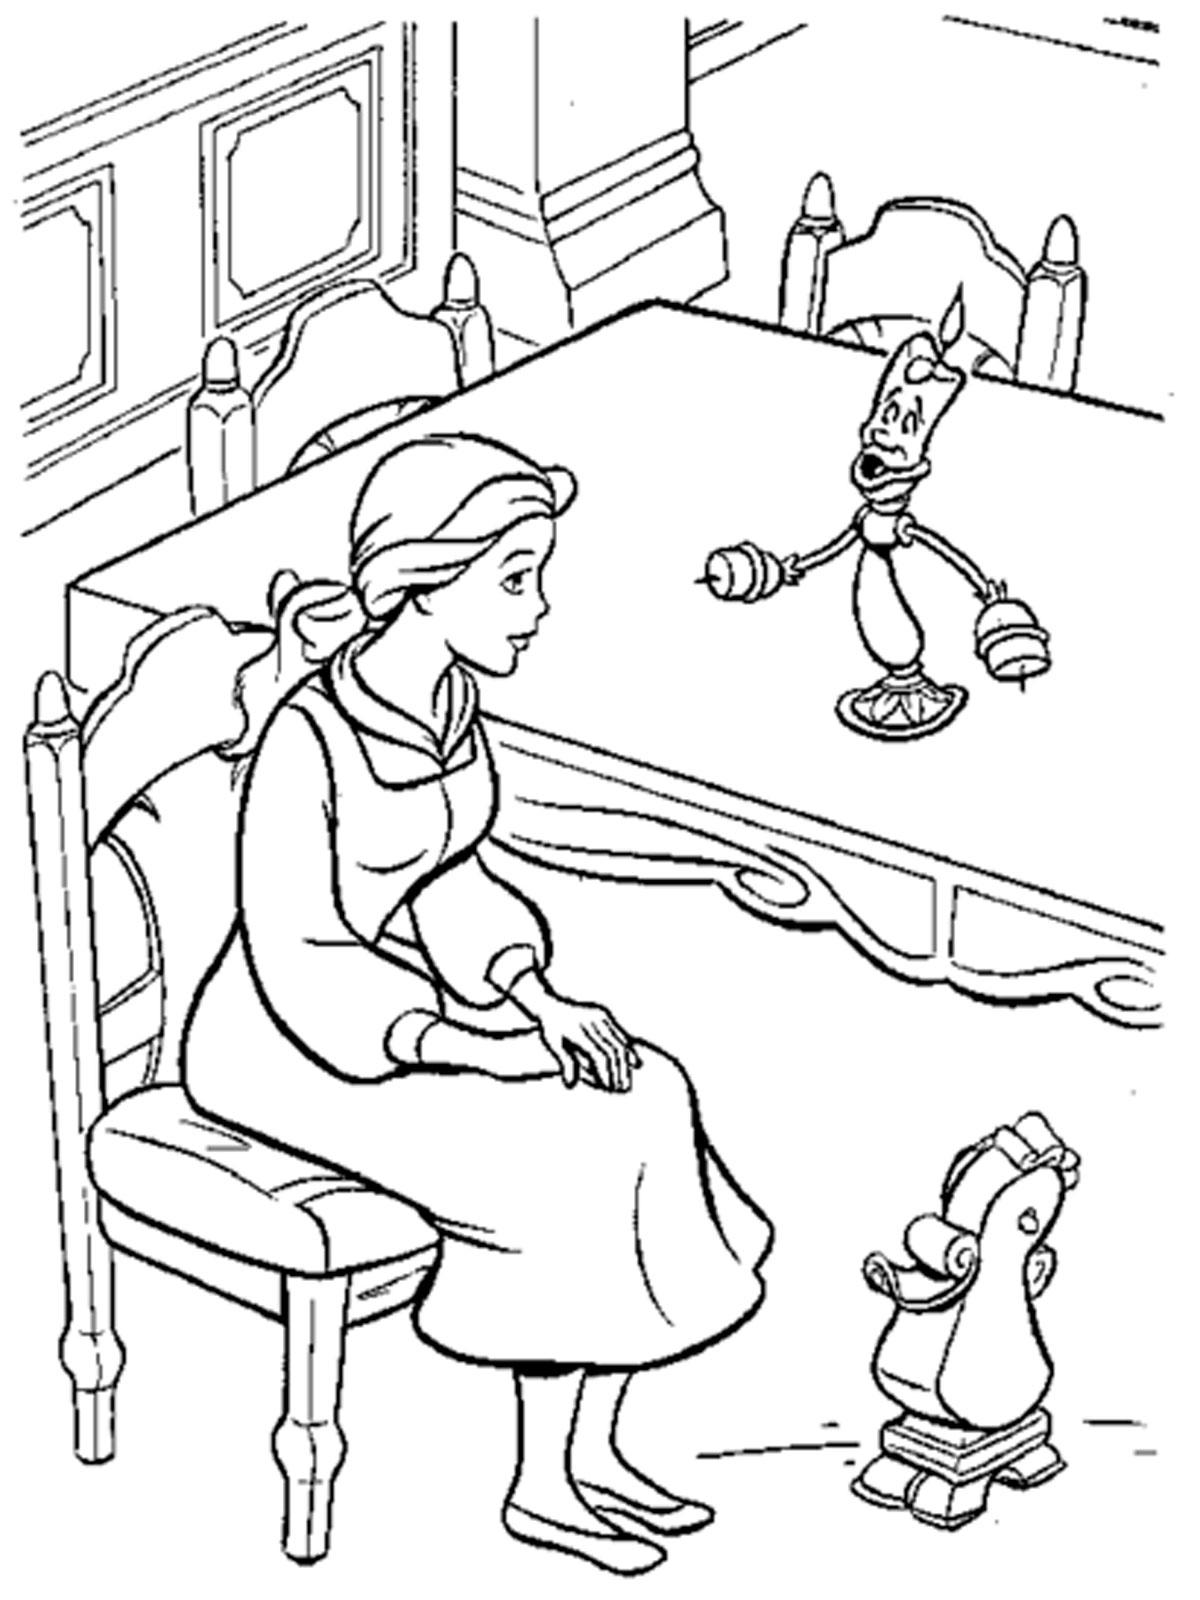 Раскраски для детей. марка